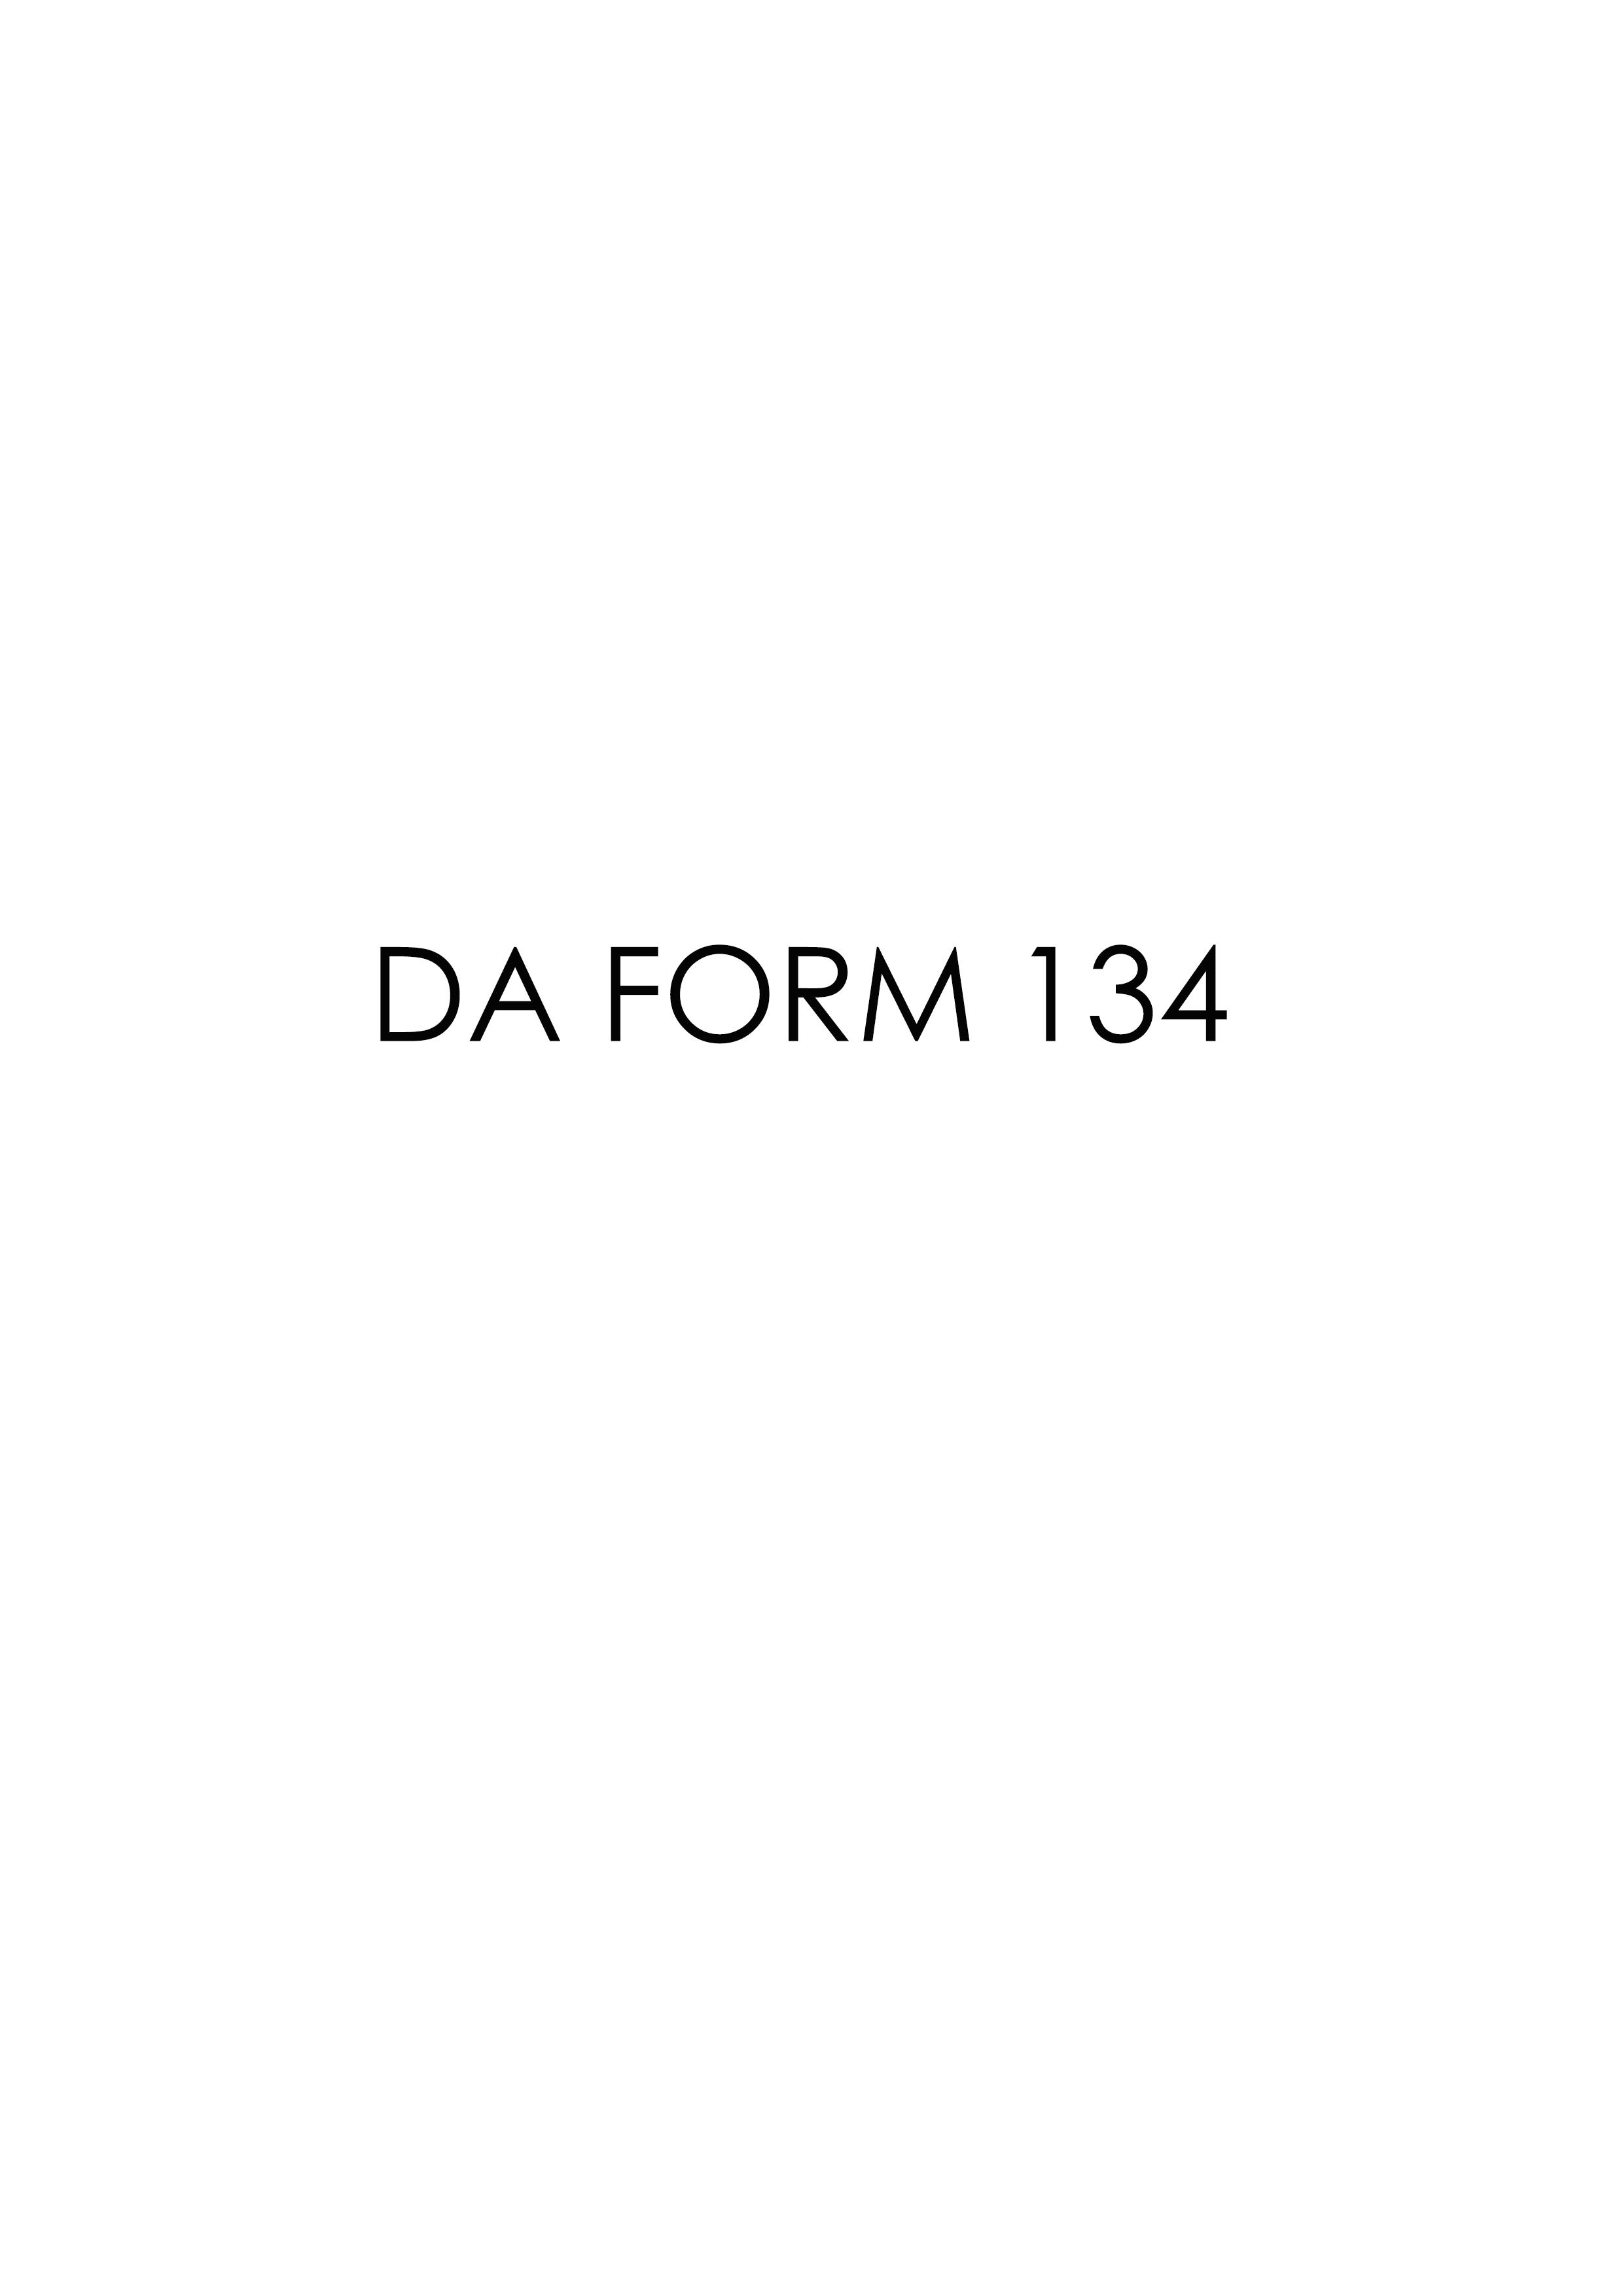 Download da Form 134 Free